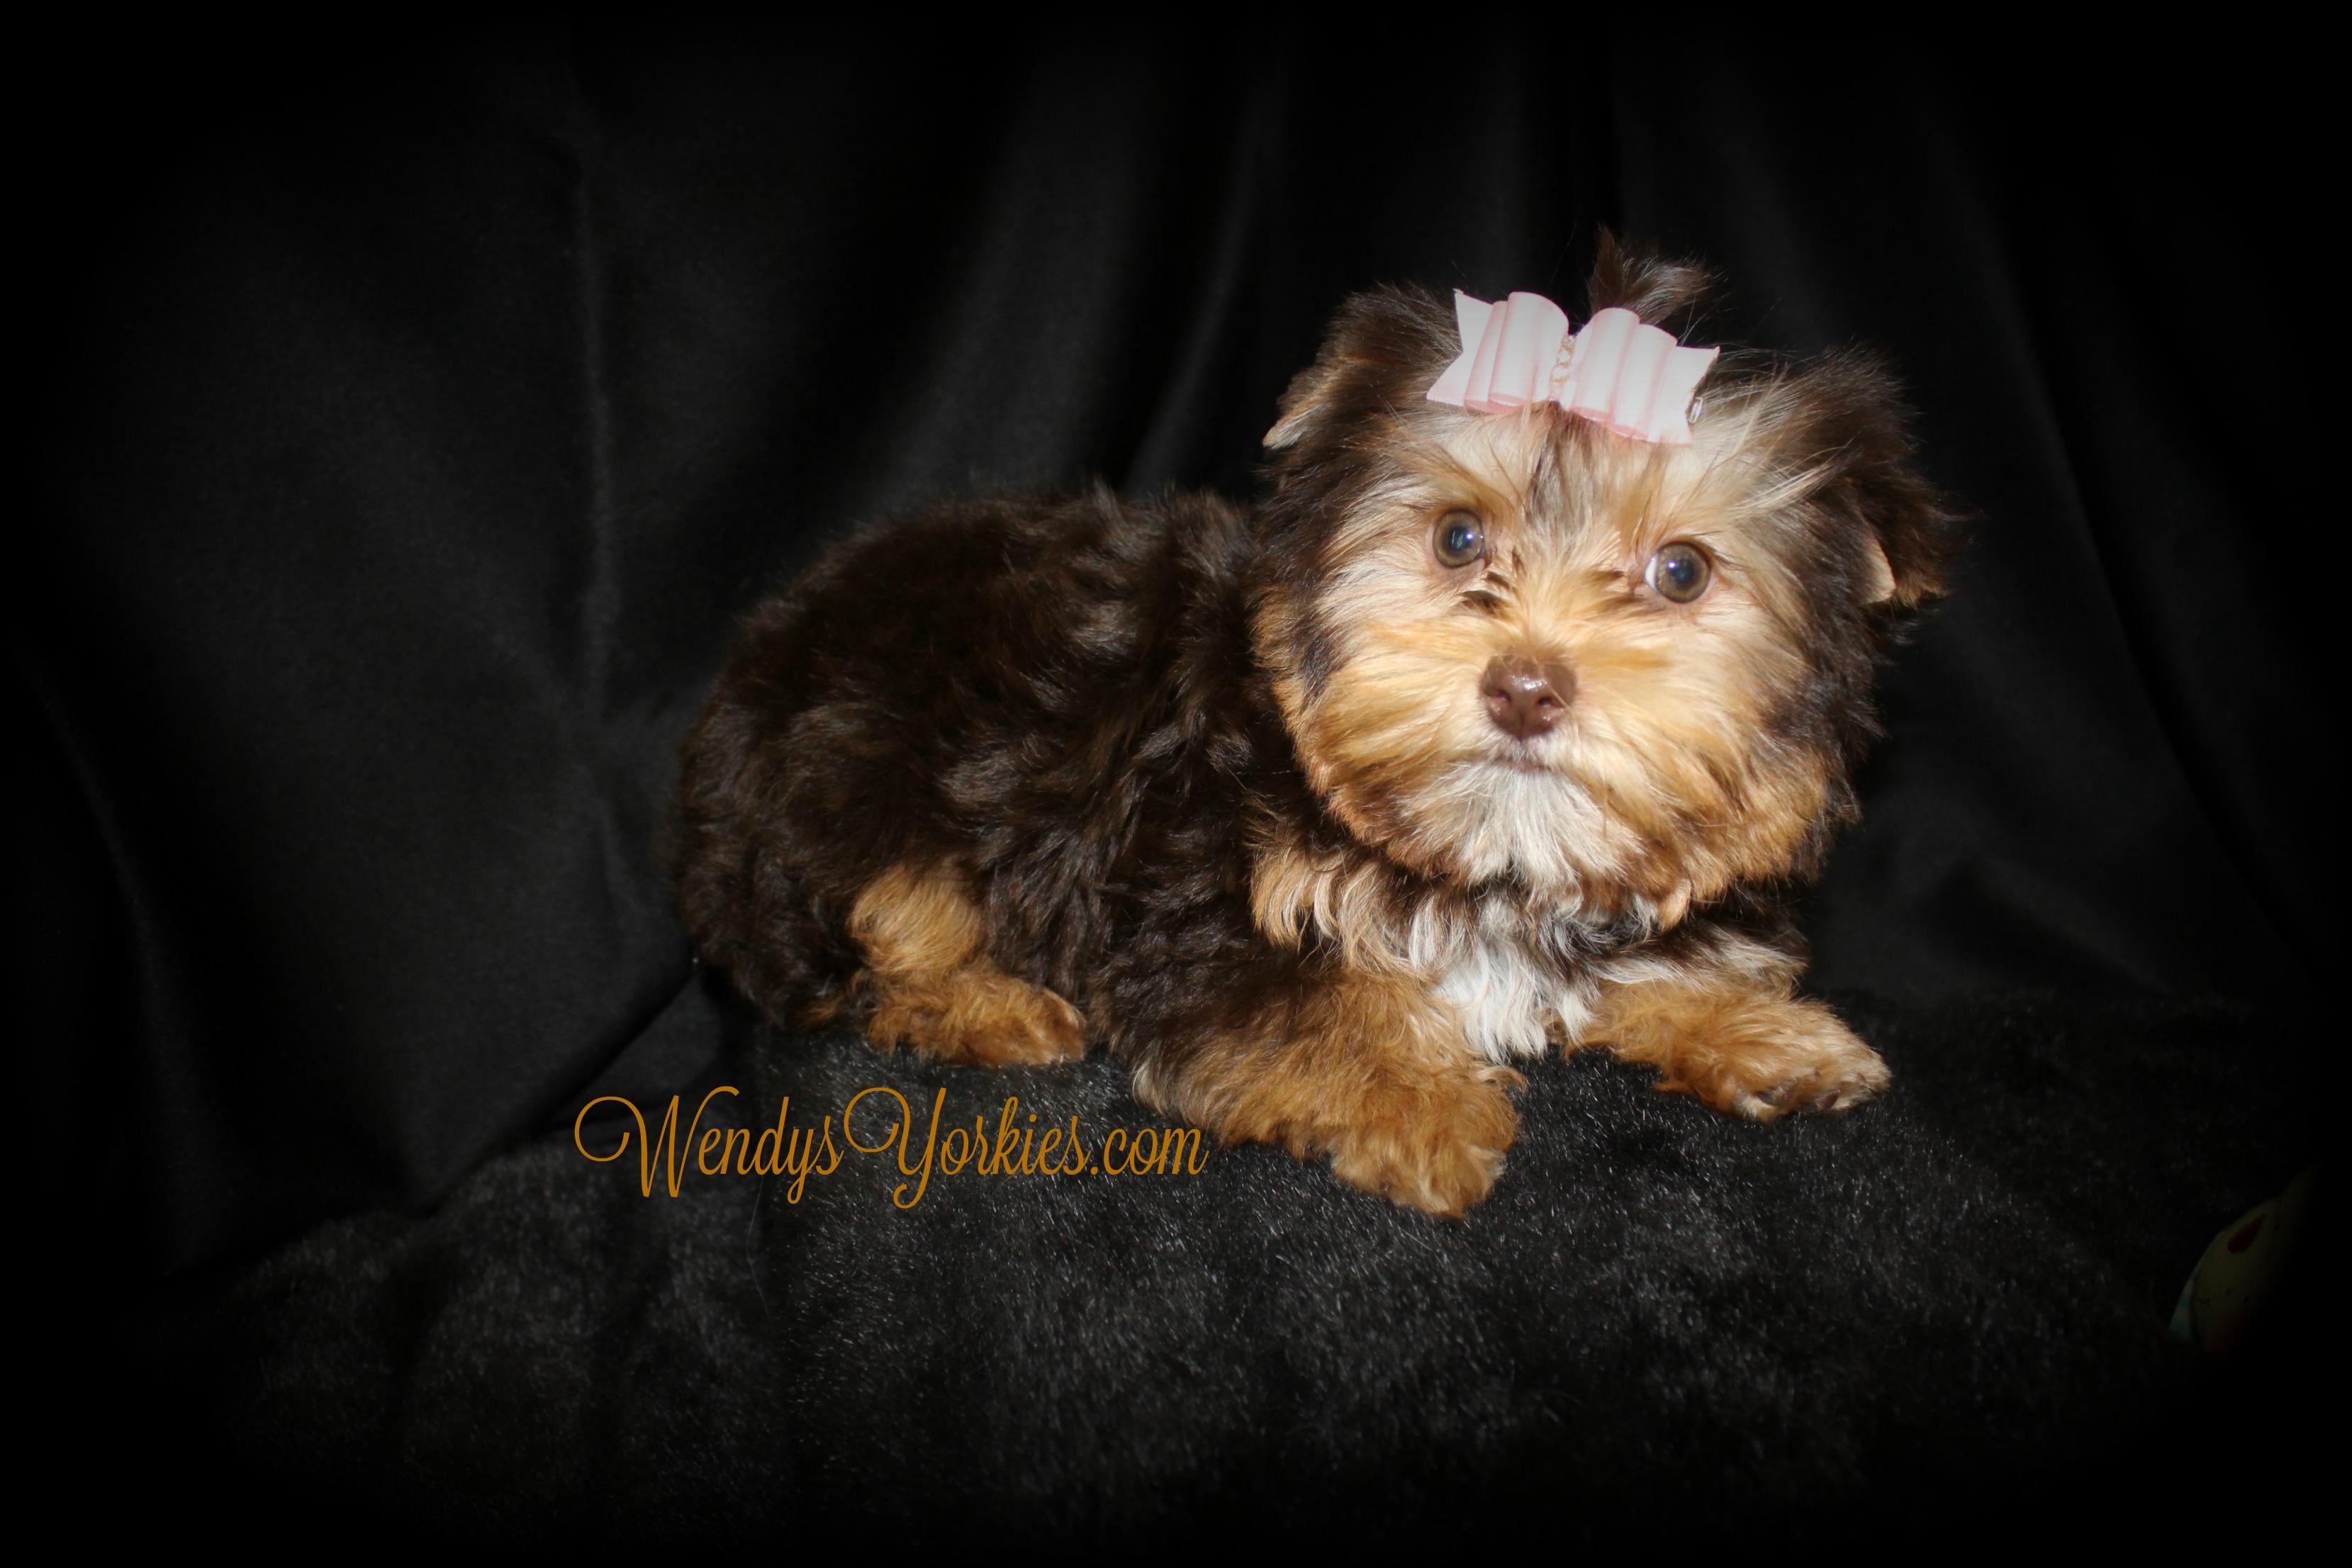 Chocolate Yorkie puppy for sale, WendysYorkies.com, Allie 4